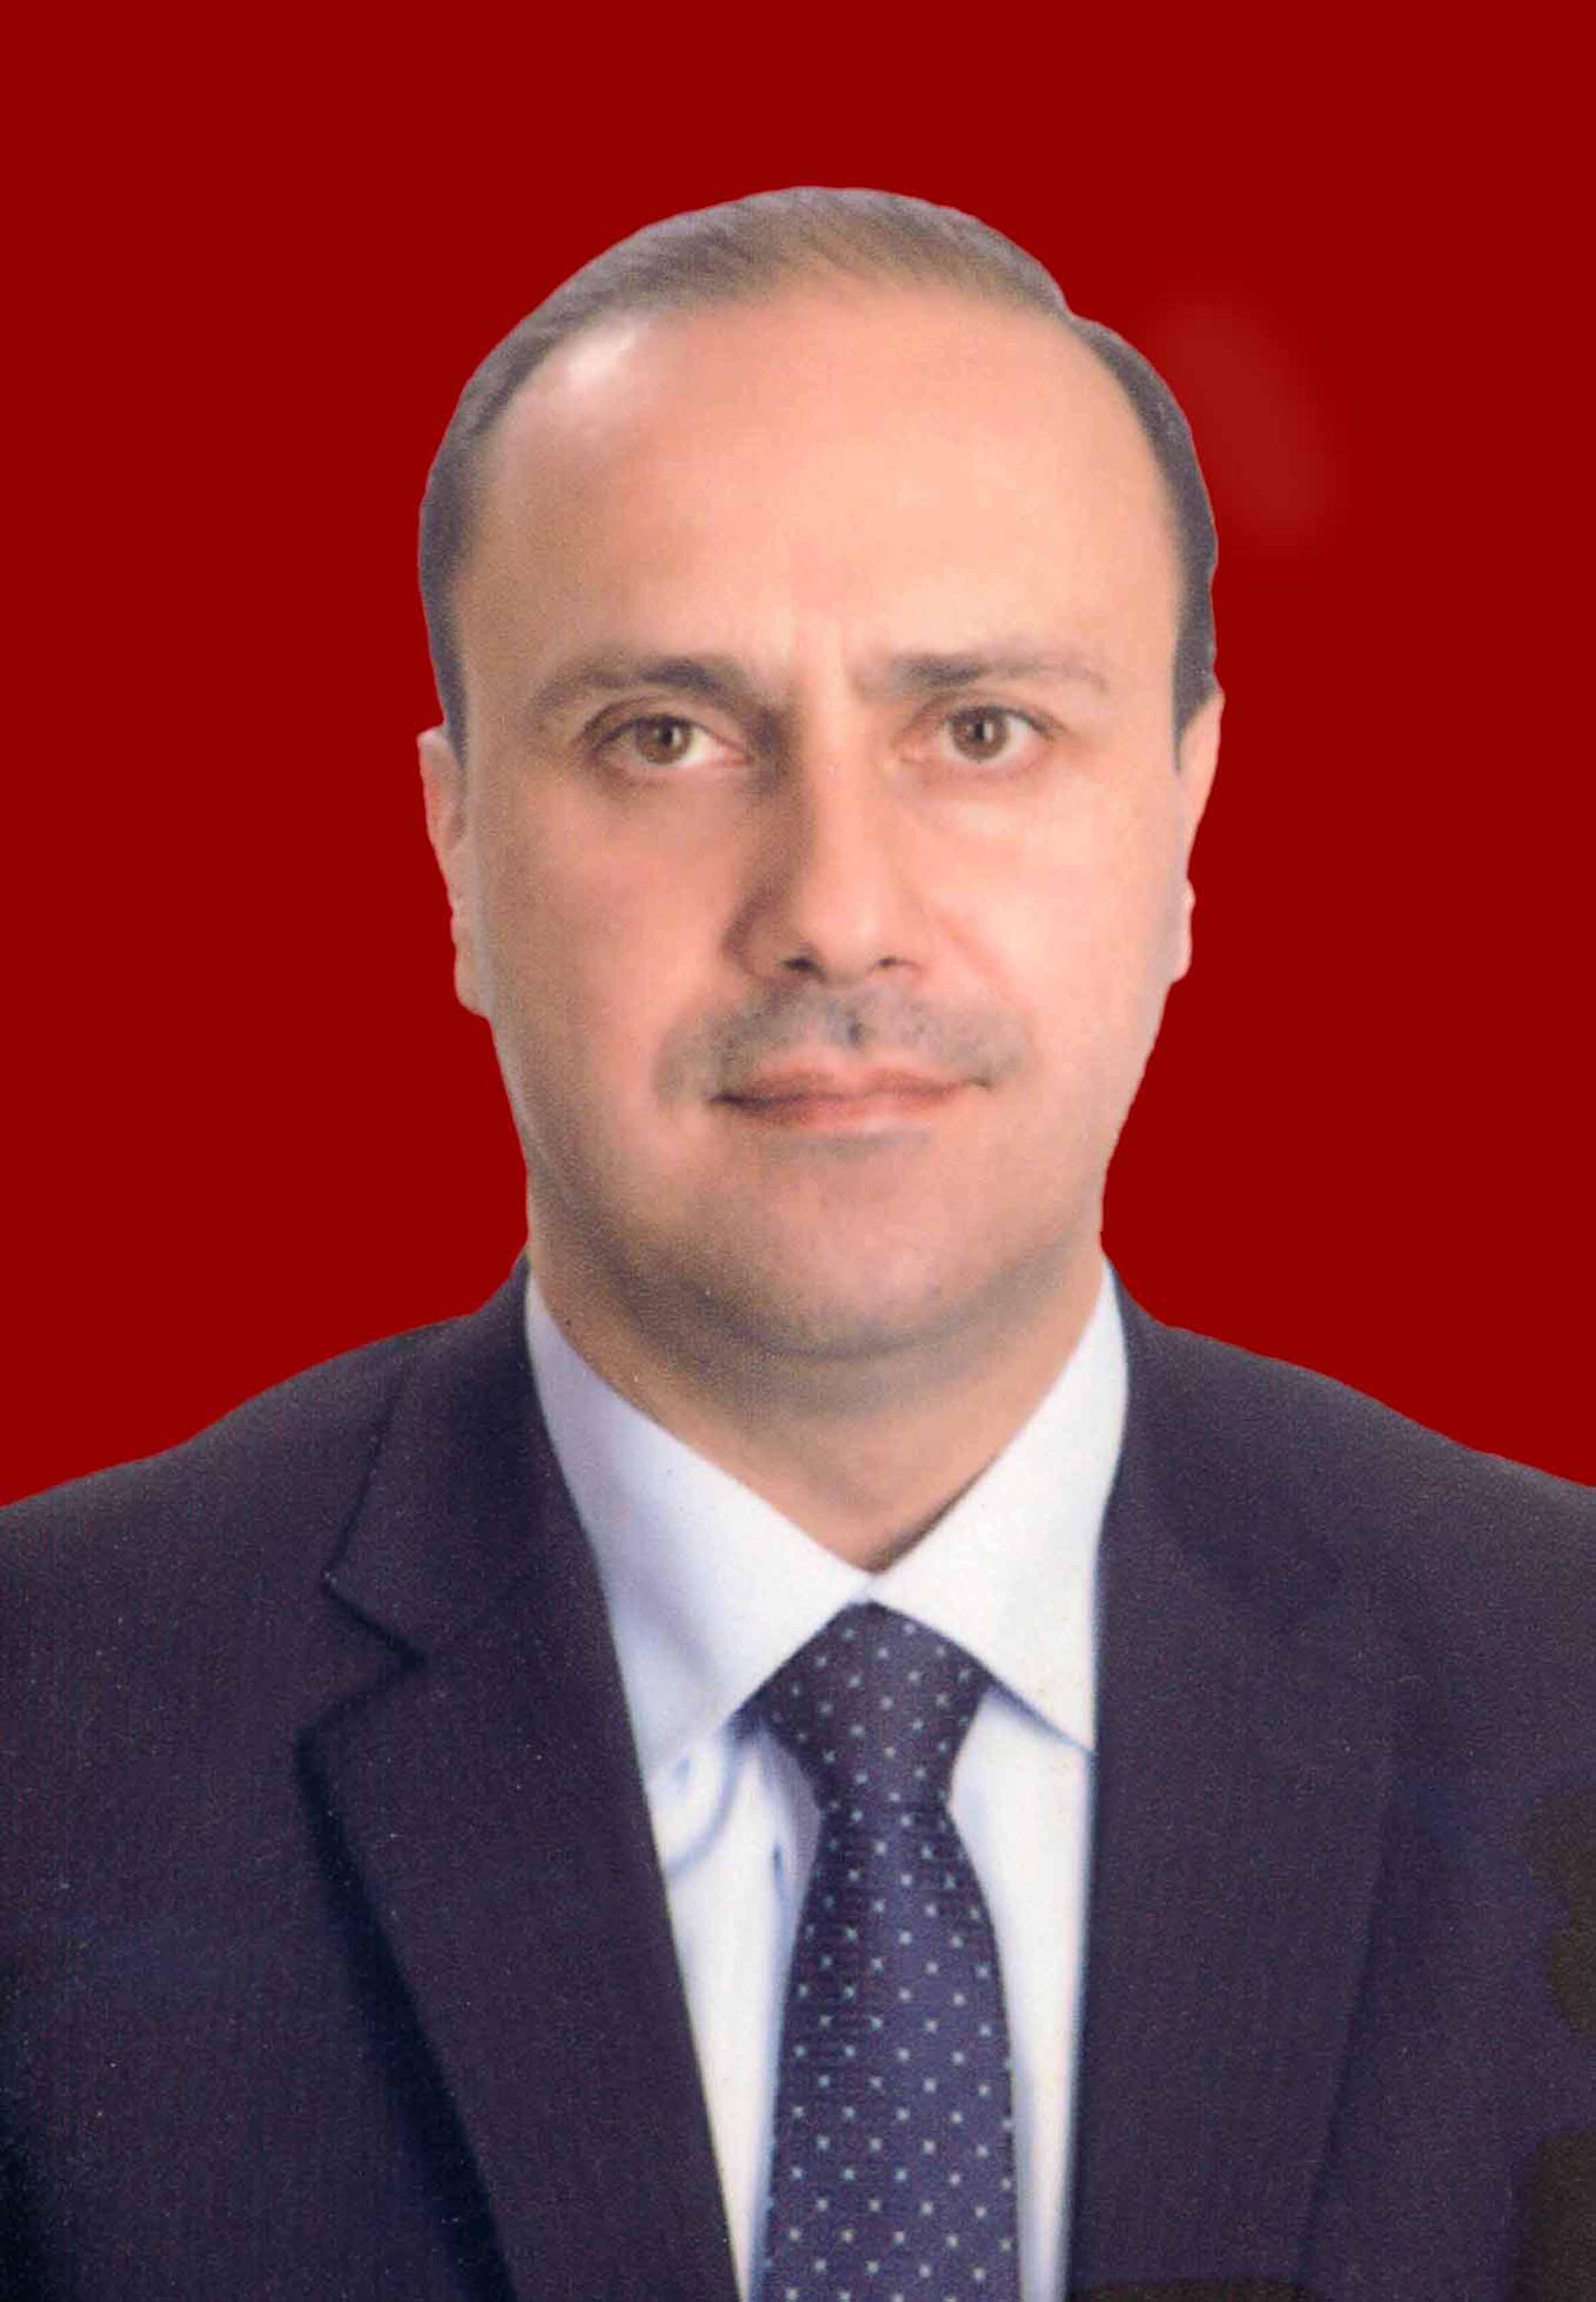 د. محمد حسين المومني